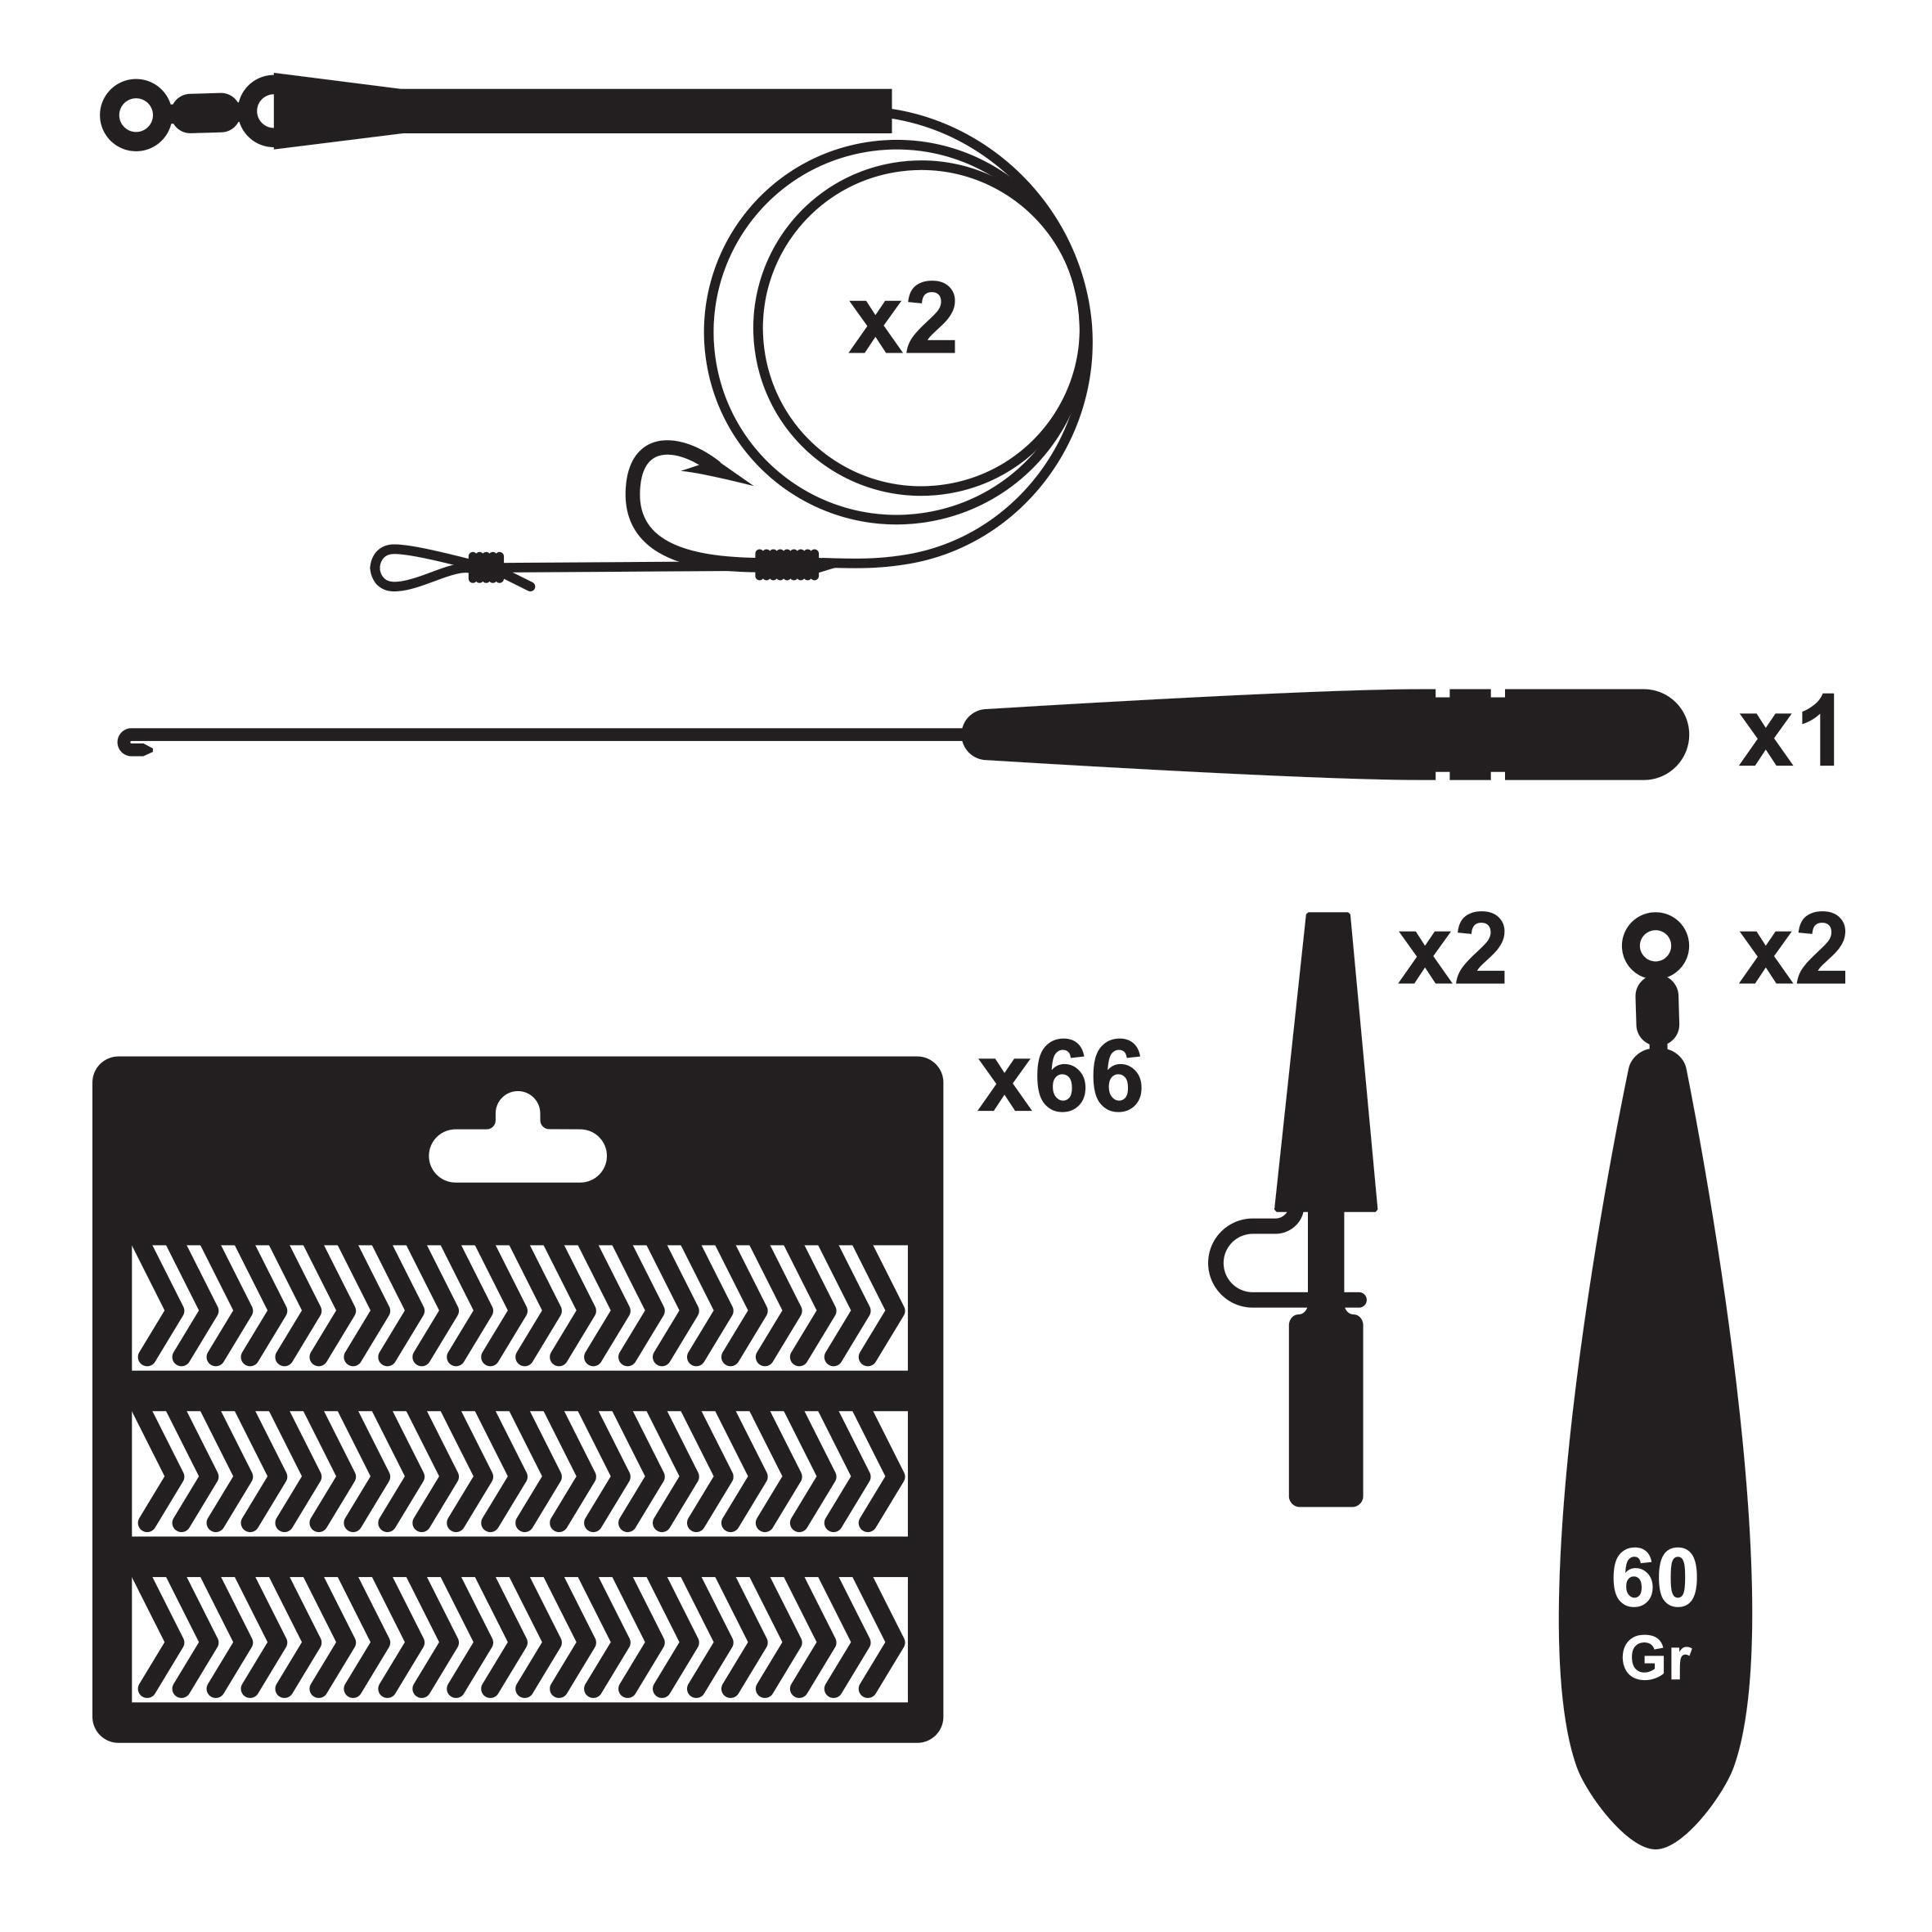 Ensemble de base pour la pêche de la carpe